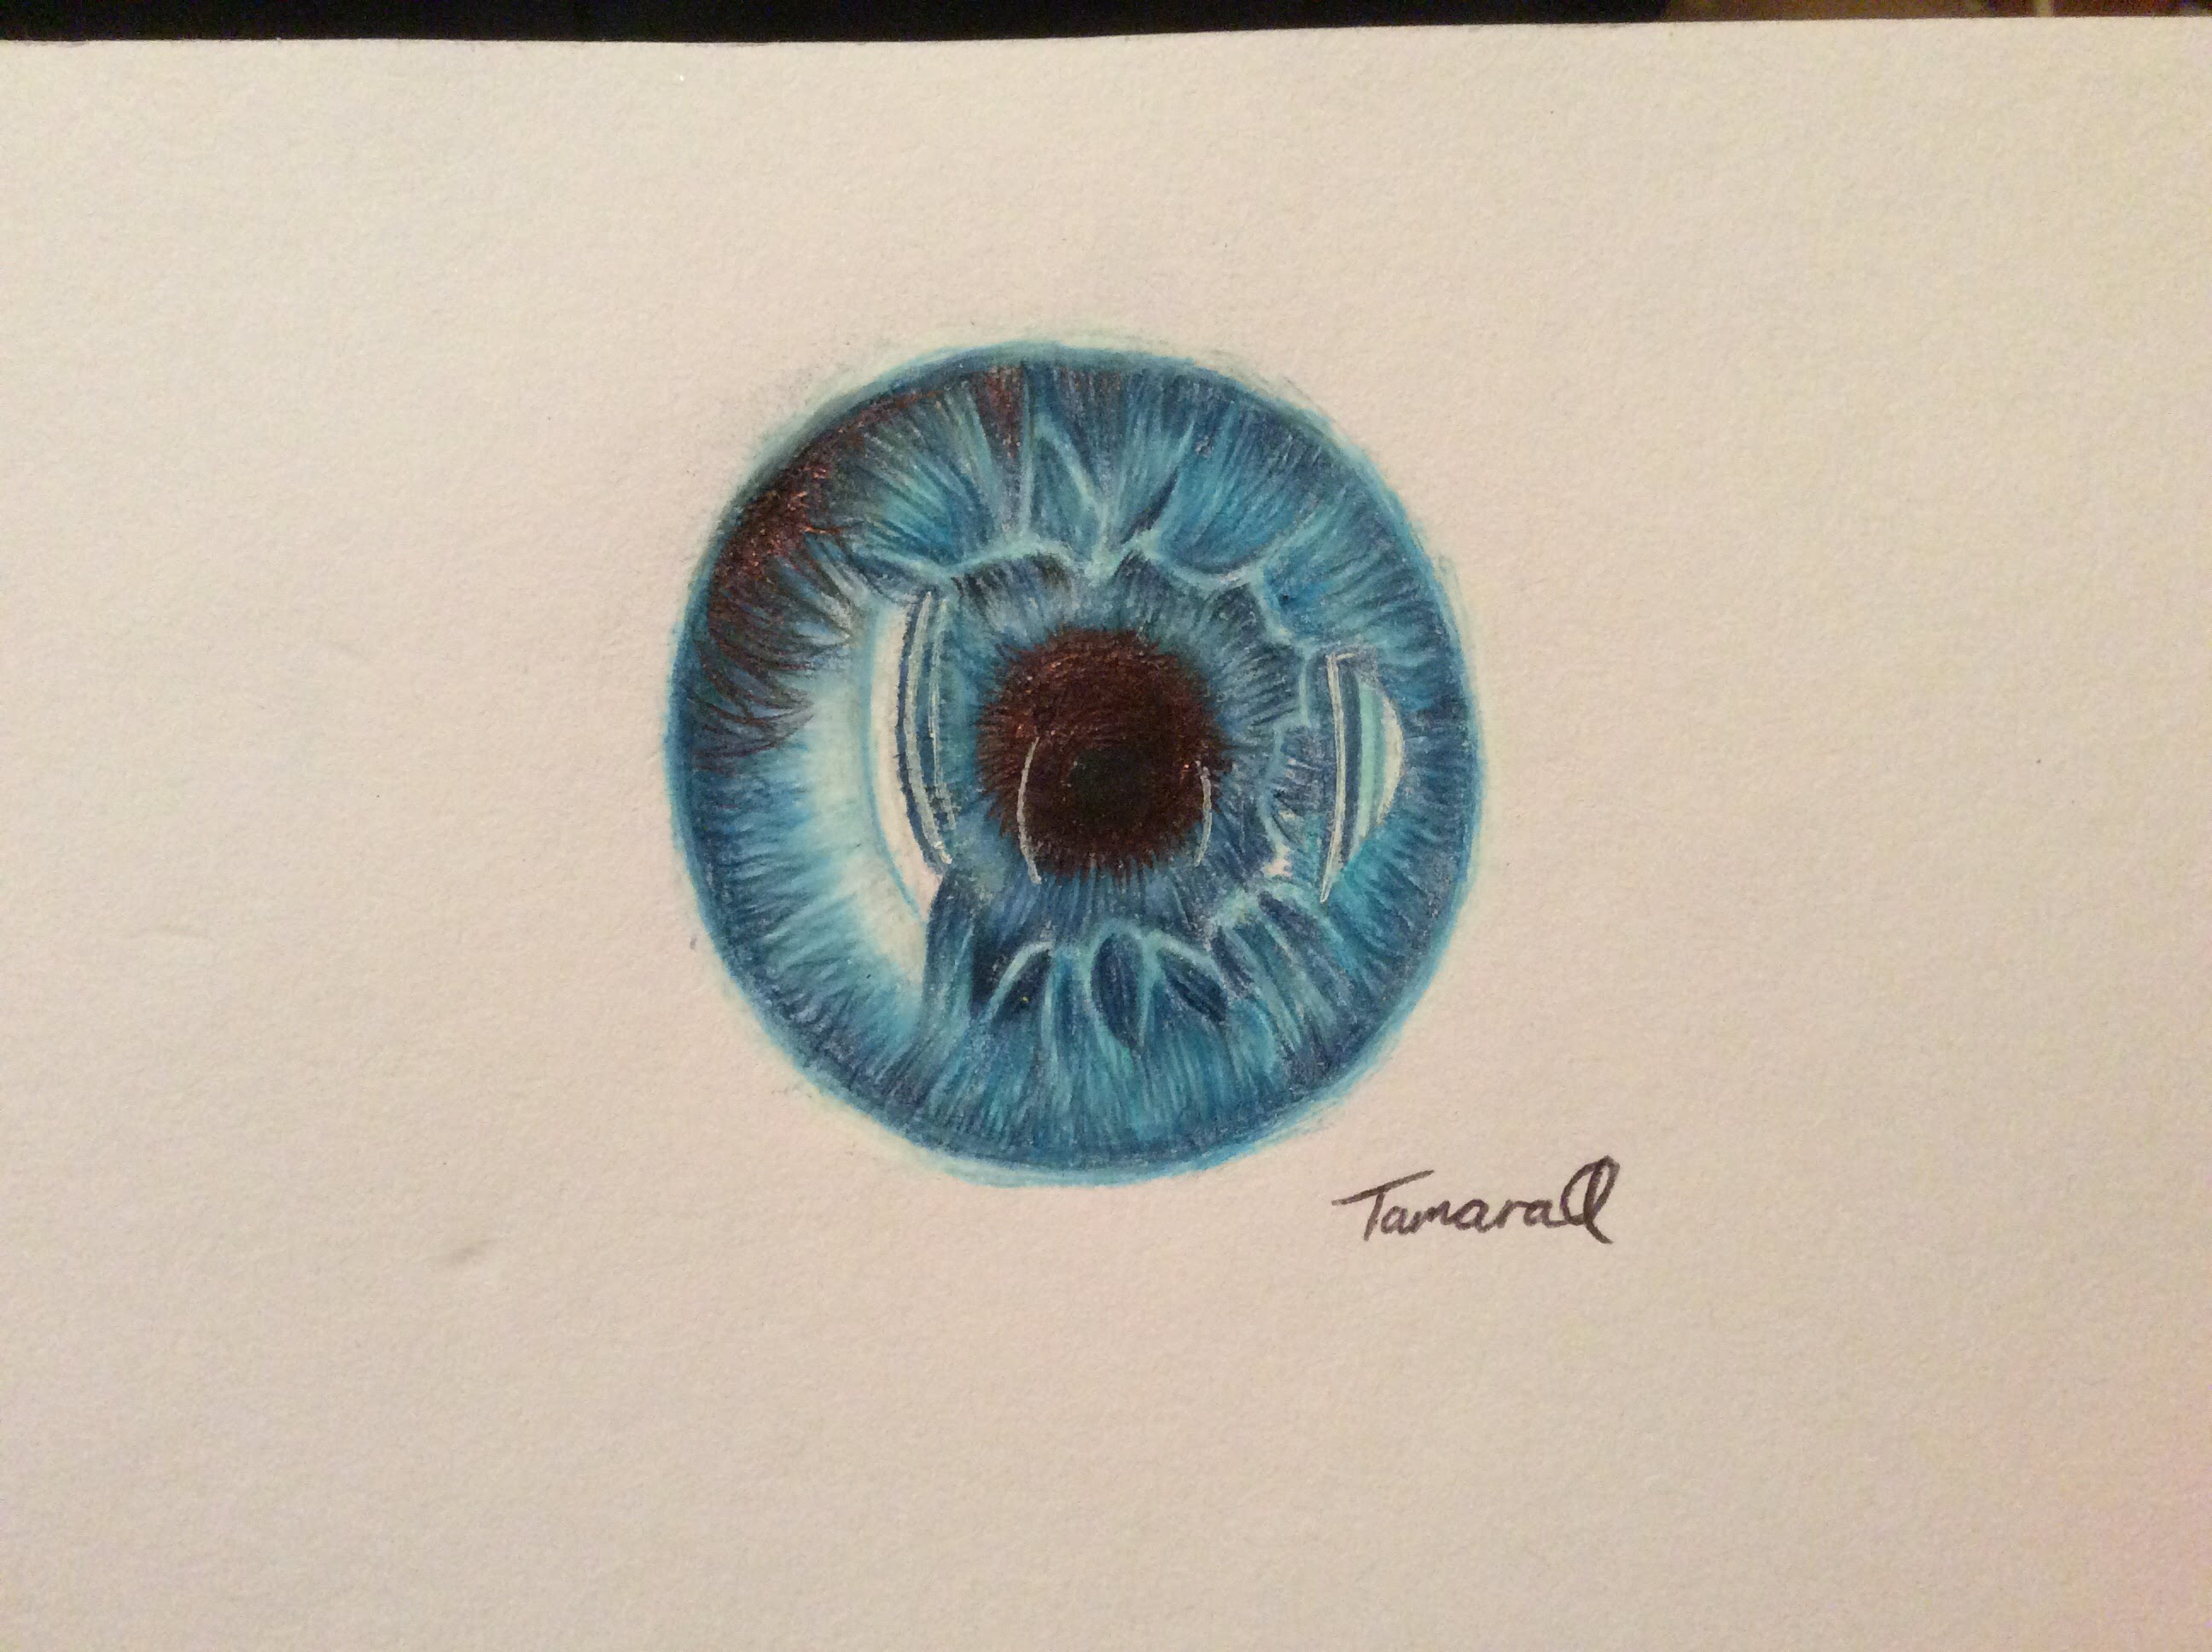 2592x1936 Eye (Iris) Speed Drawing